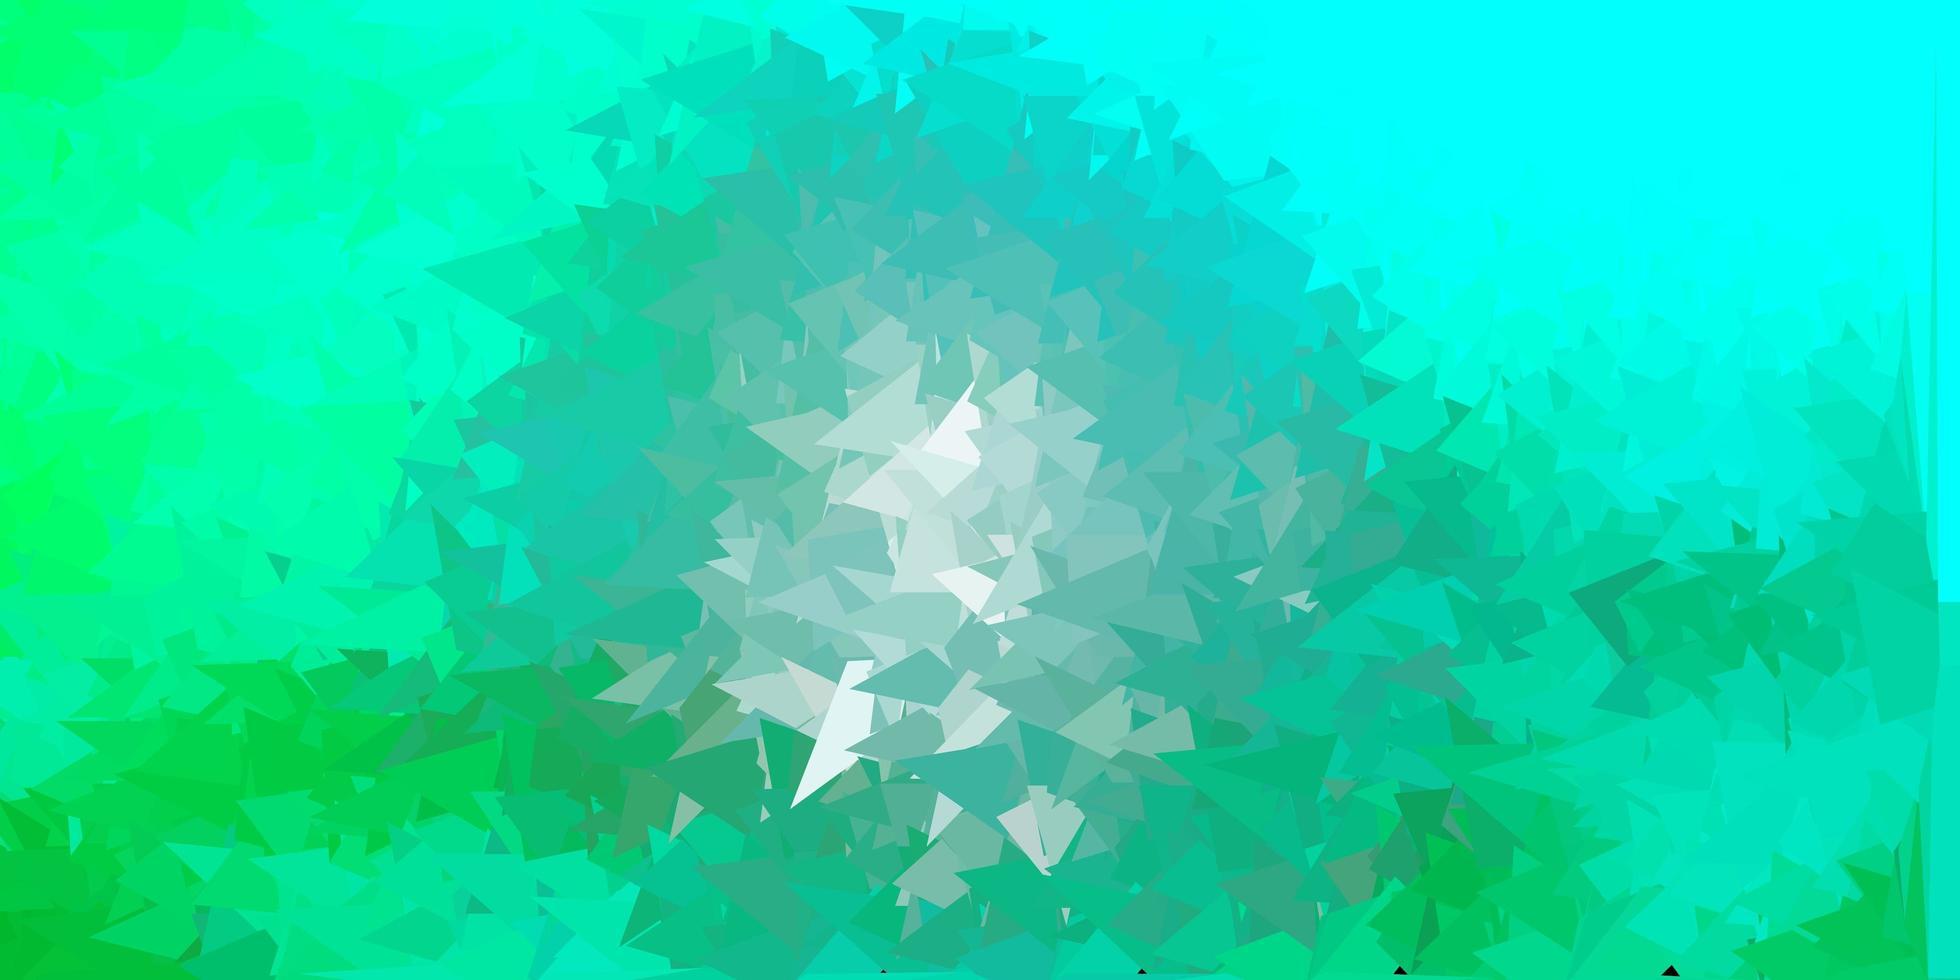 ljusgrön vektor polygonal bakgrund.